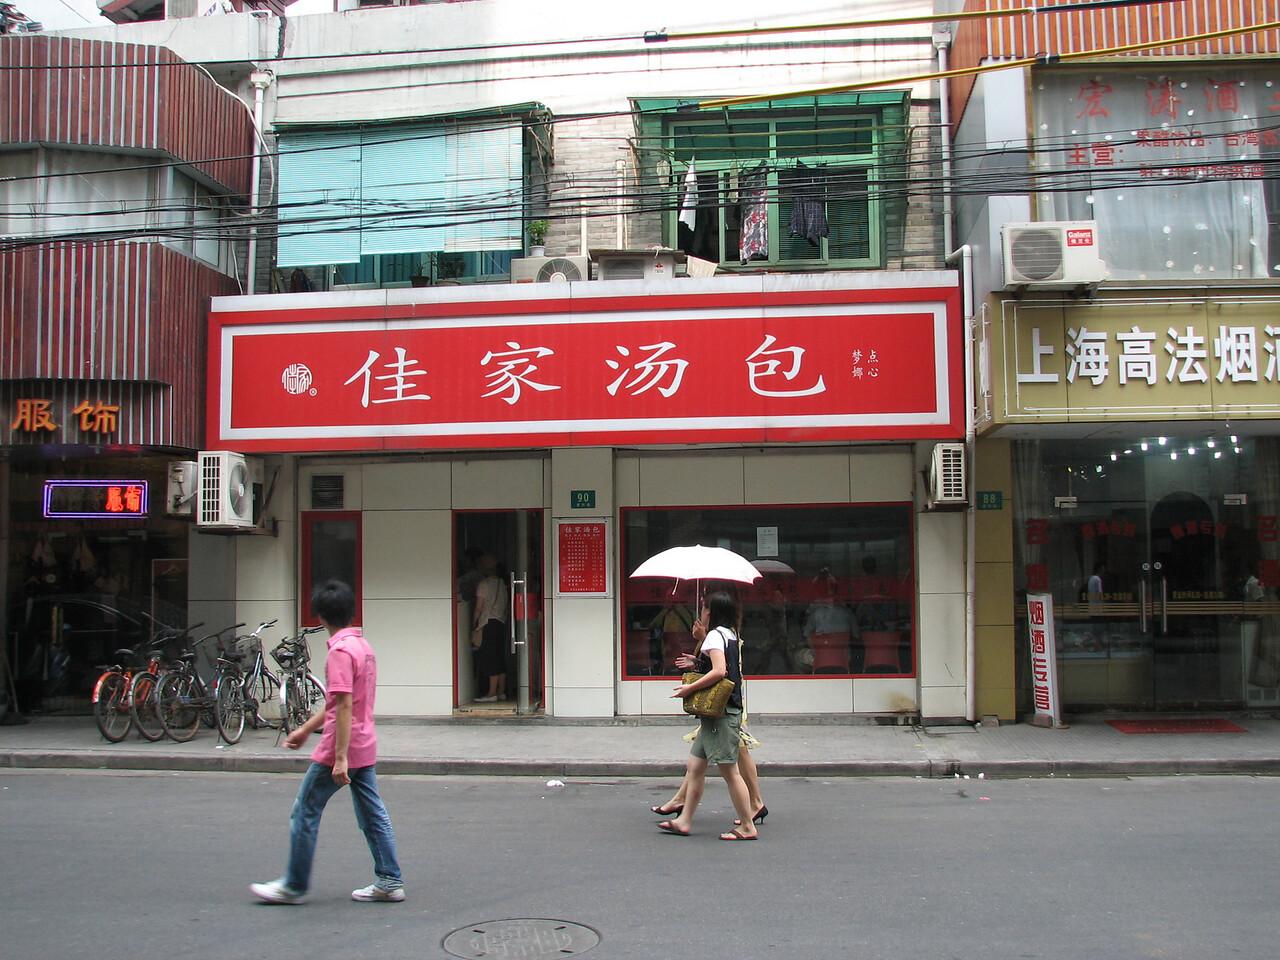 Pretty good dumpling place a couple blocks off Nanjing Lu